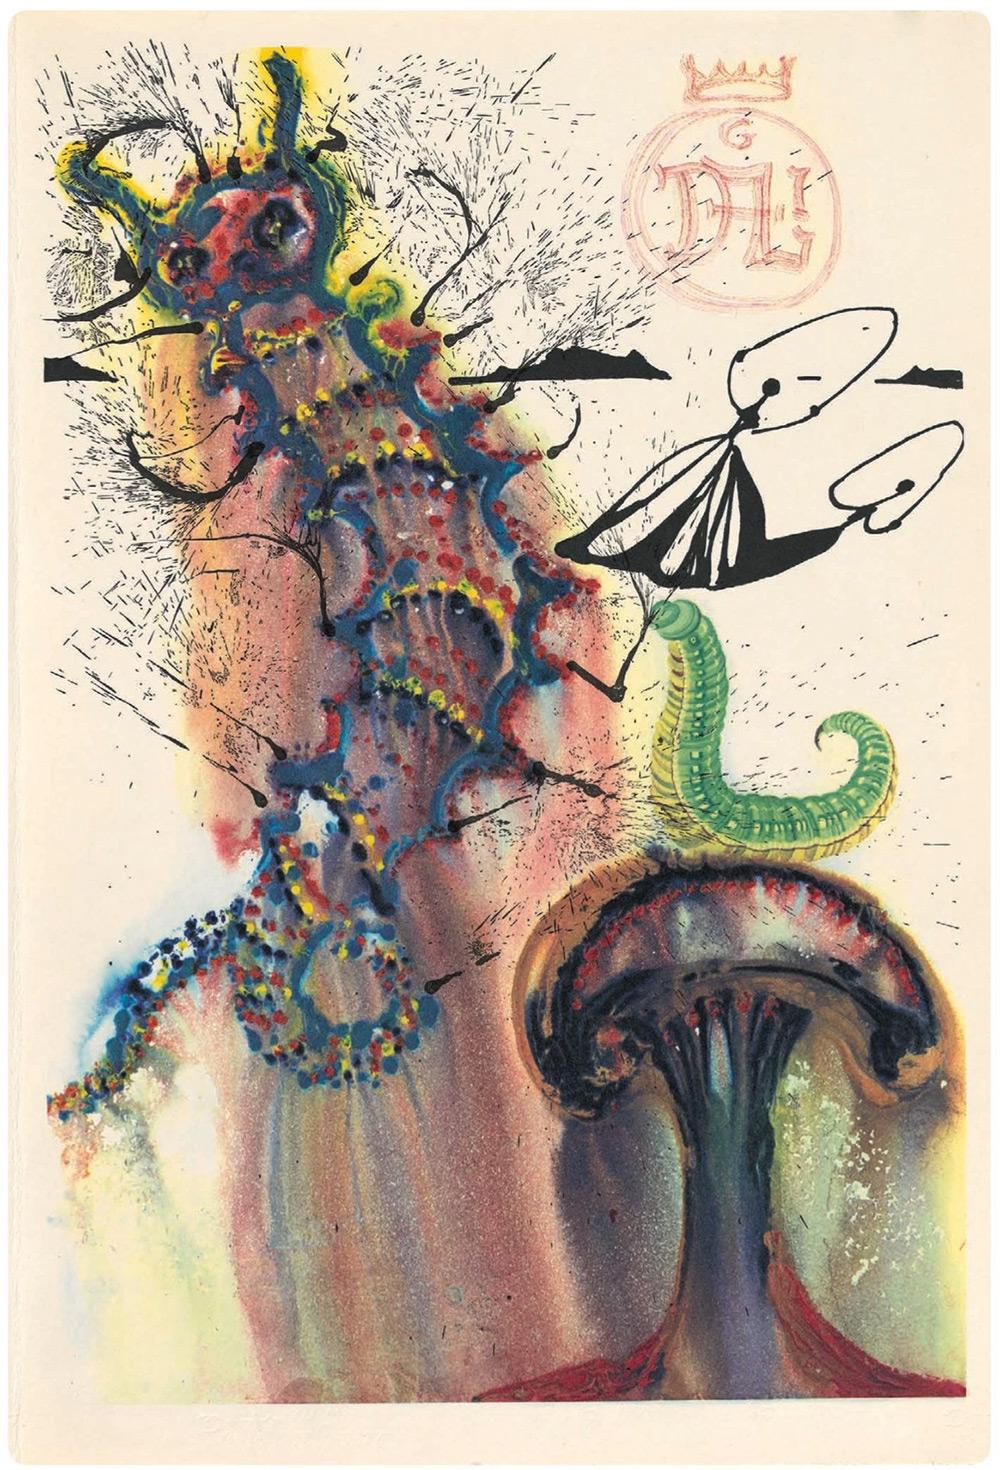 dali-alice-pays-merveille-livre-illustration-05